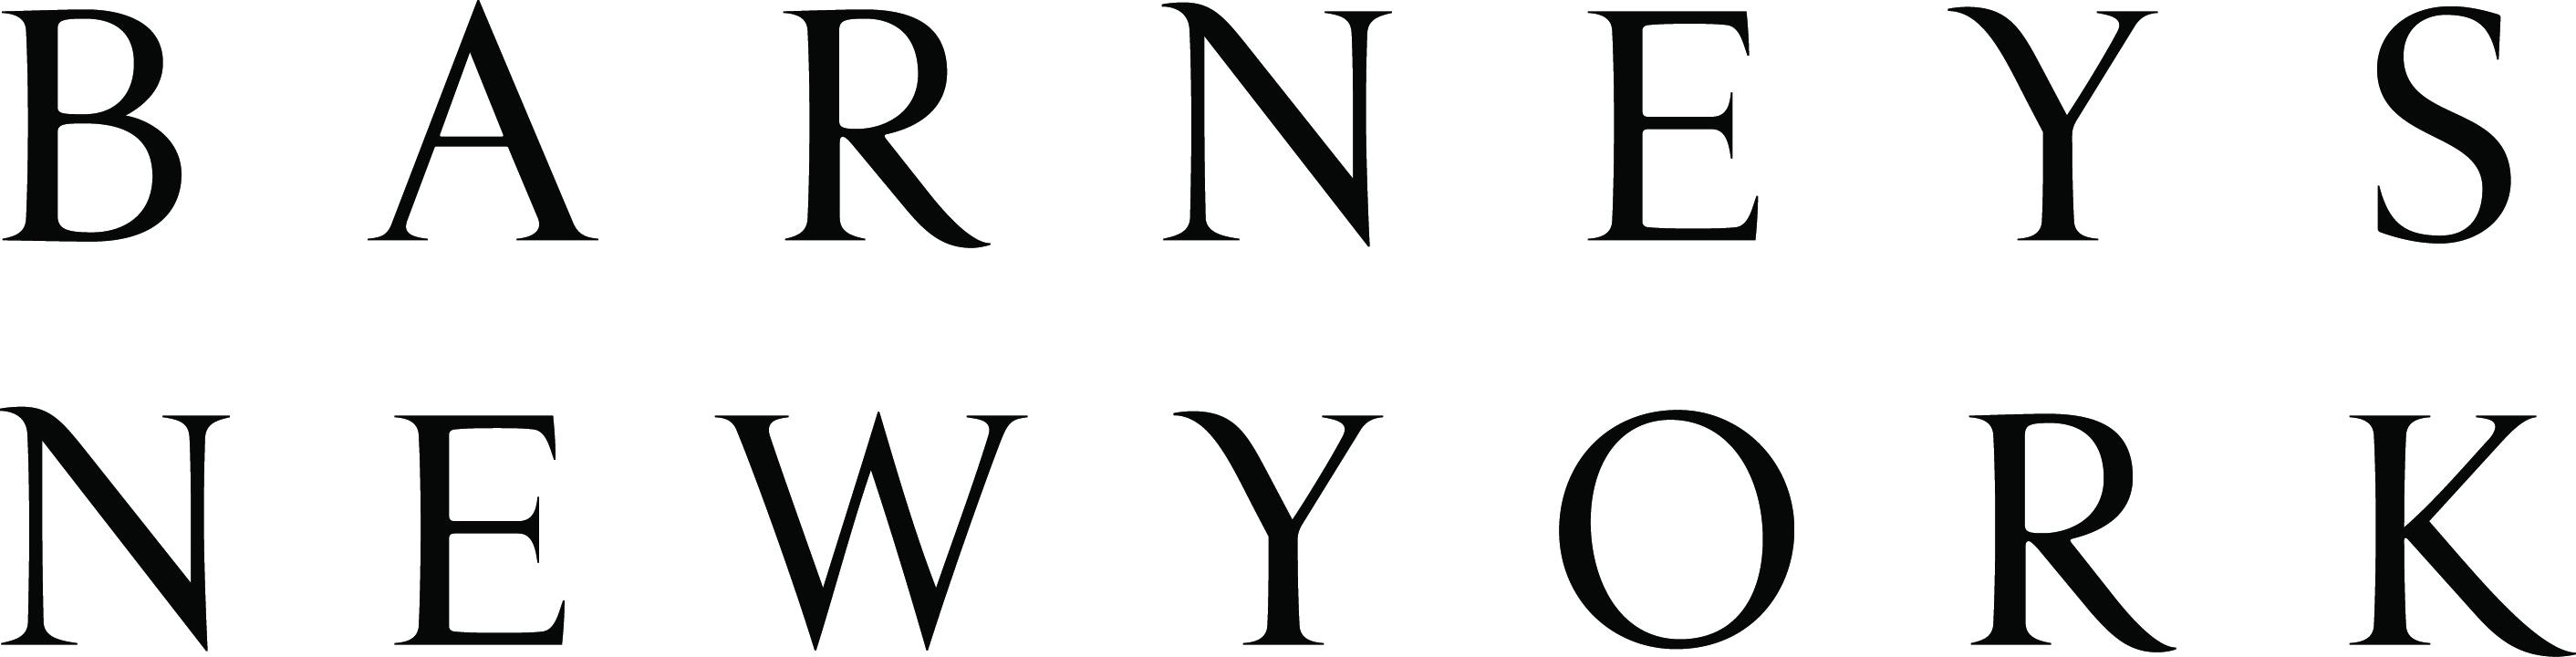 Barneys new york Logos.